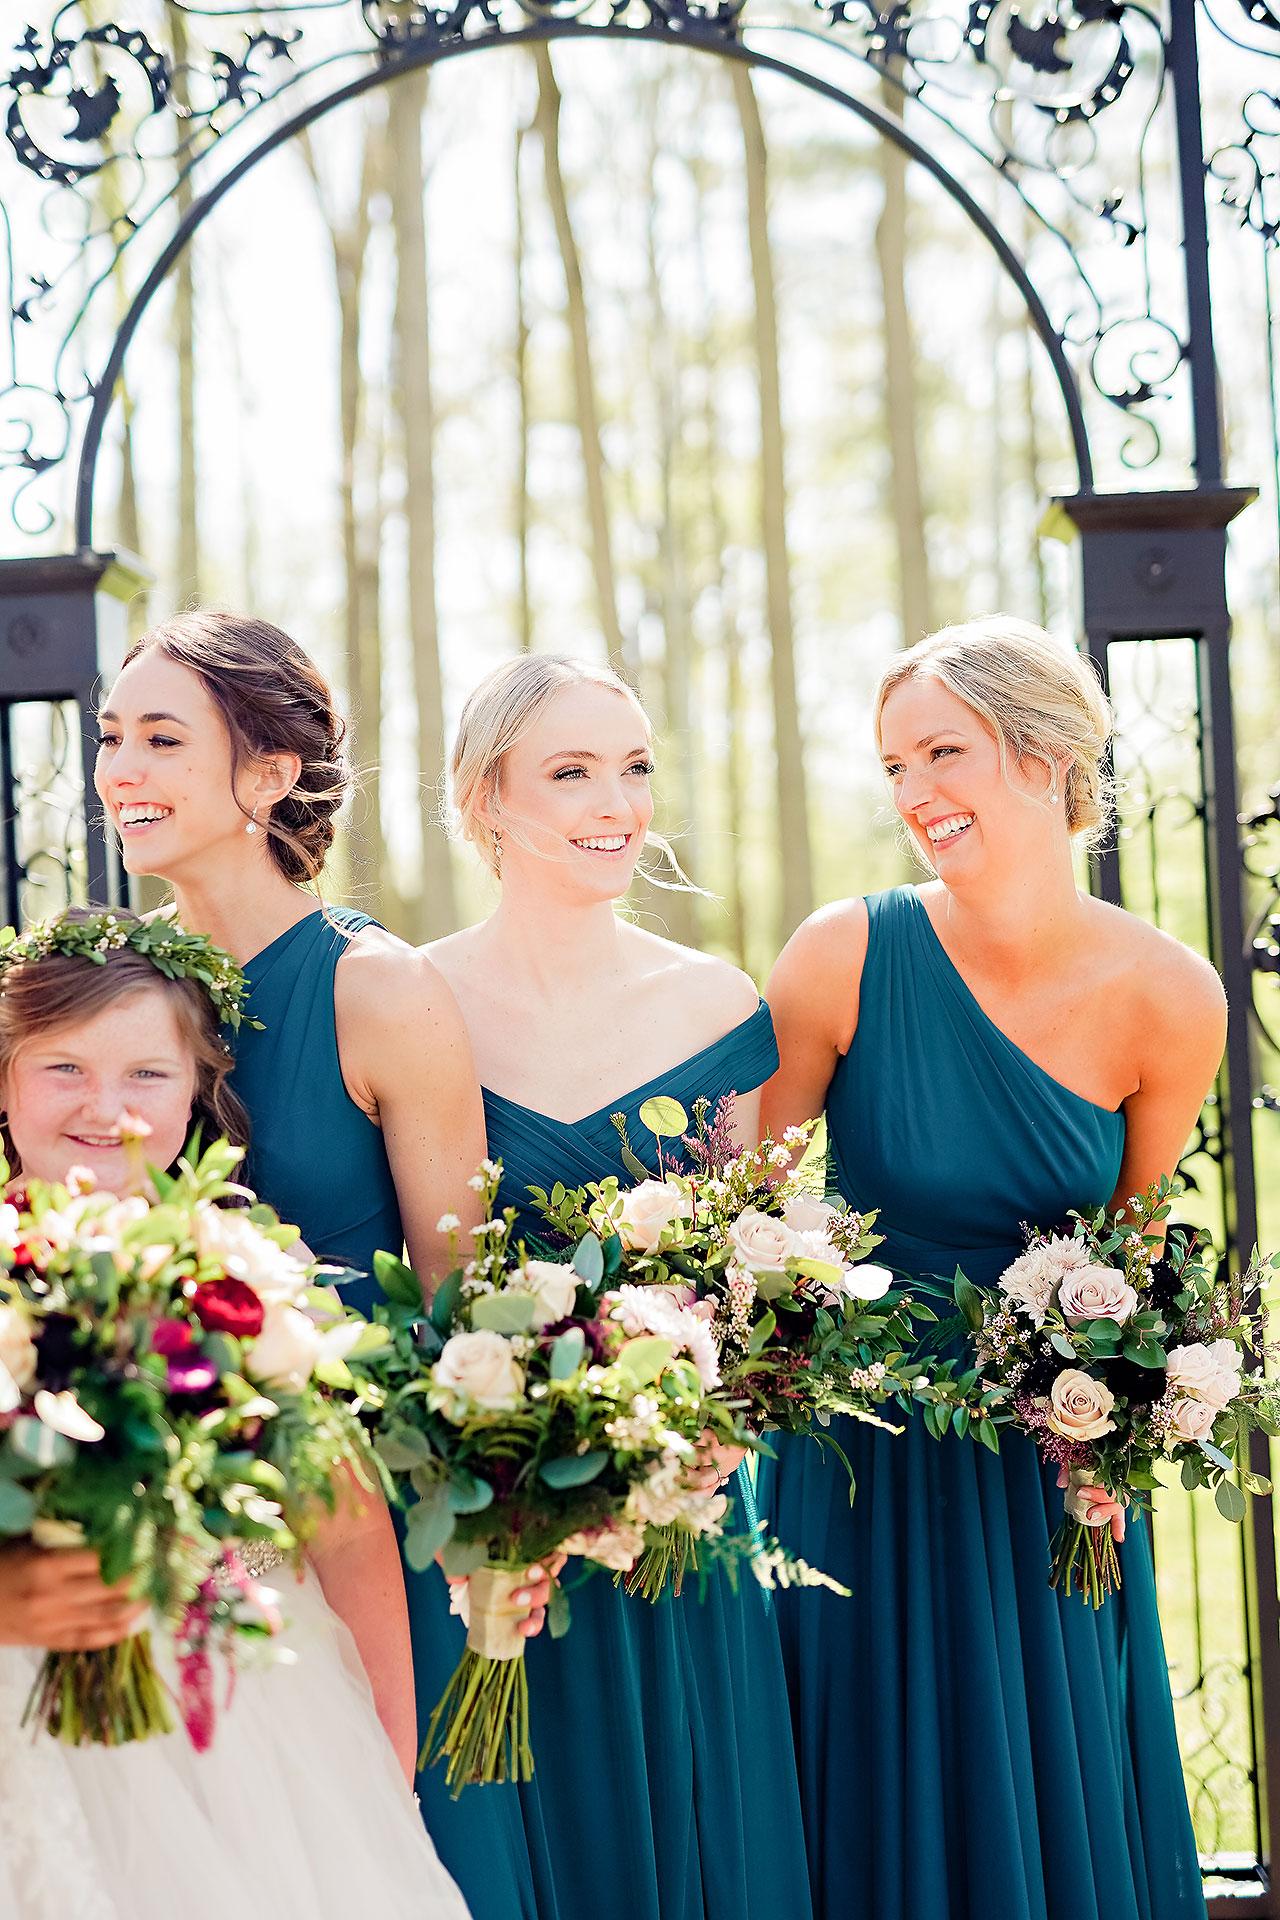 Nadia Parker Black Iris Estate Carmel Indiana Wedding May 2021 106